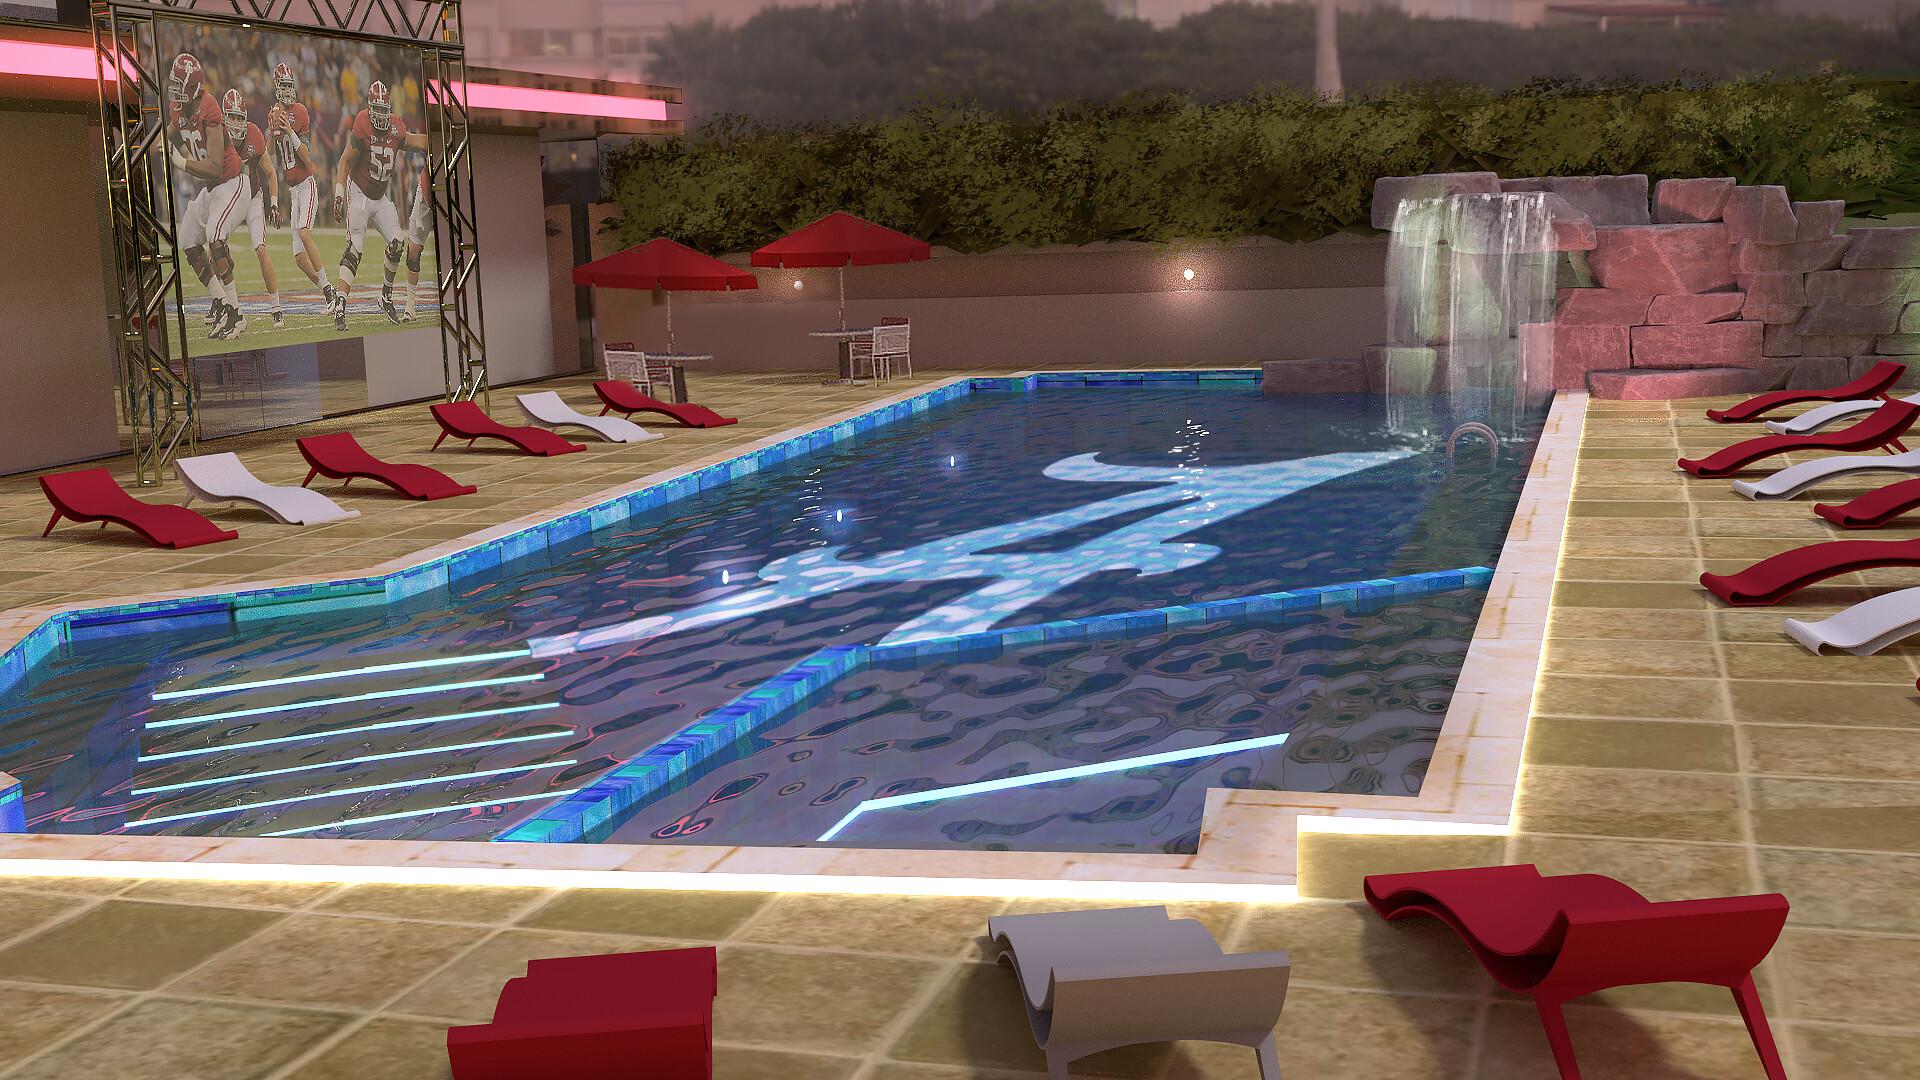 Danny kundzinsh hotel pool final render2